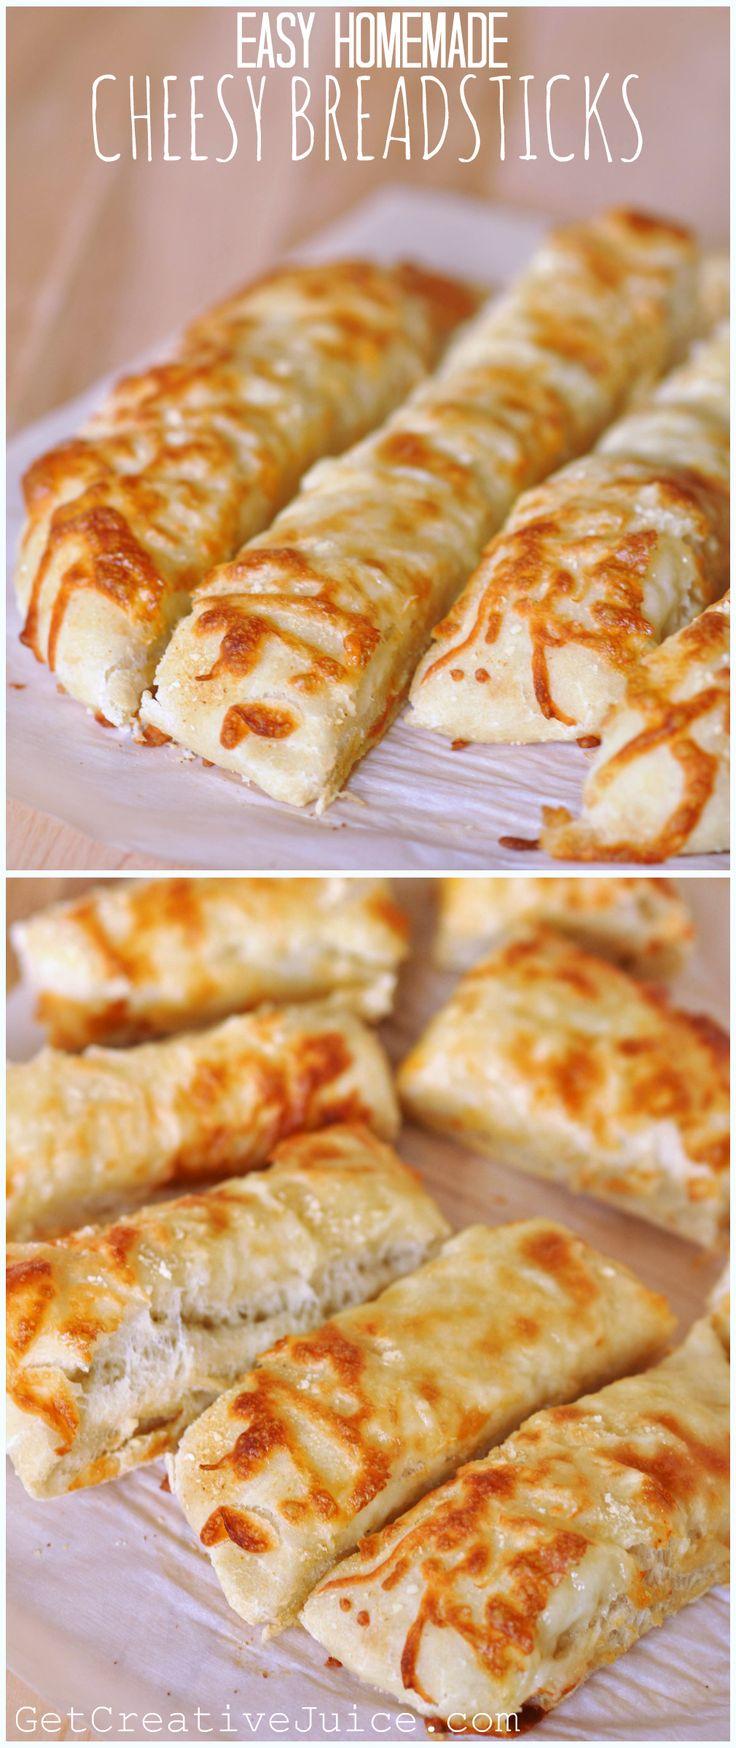 Easy Homemade Cheesy Breadsticks